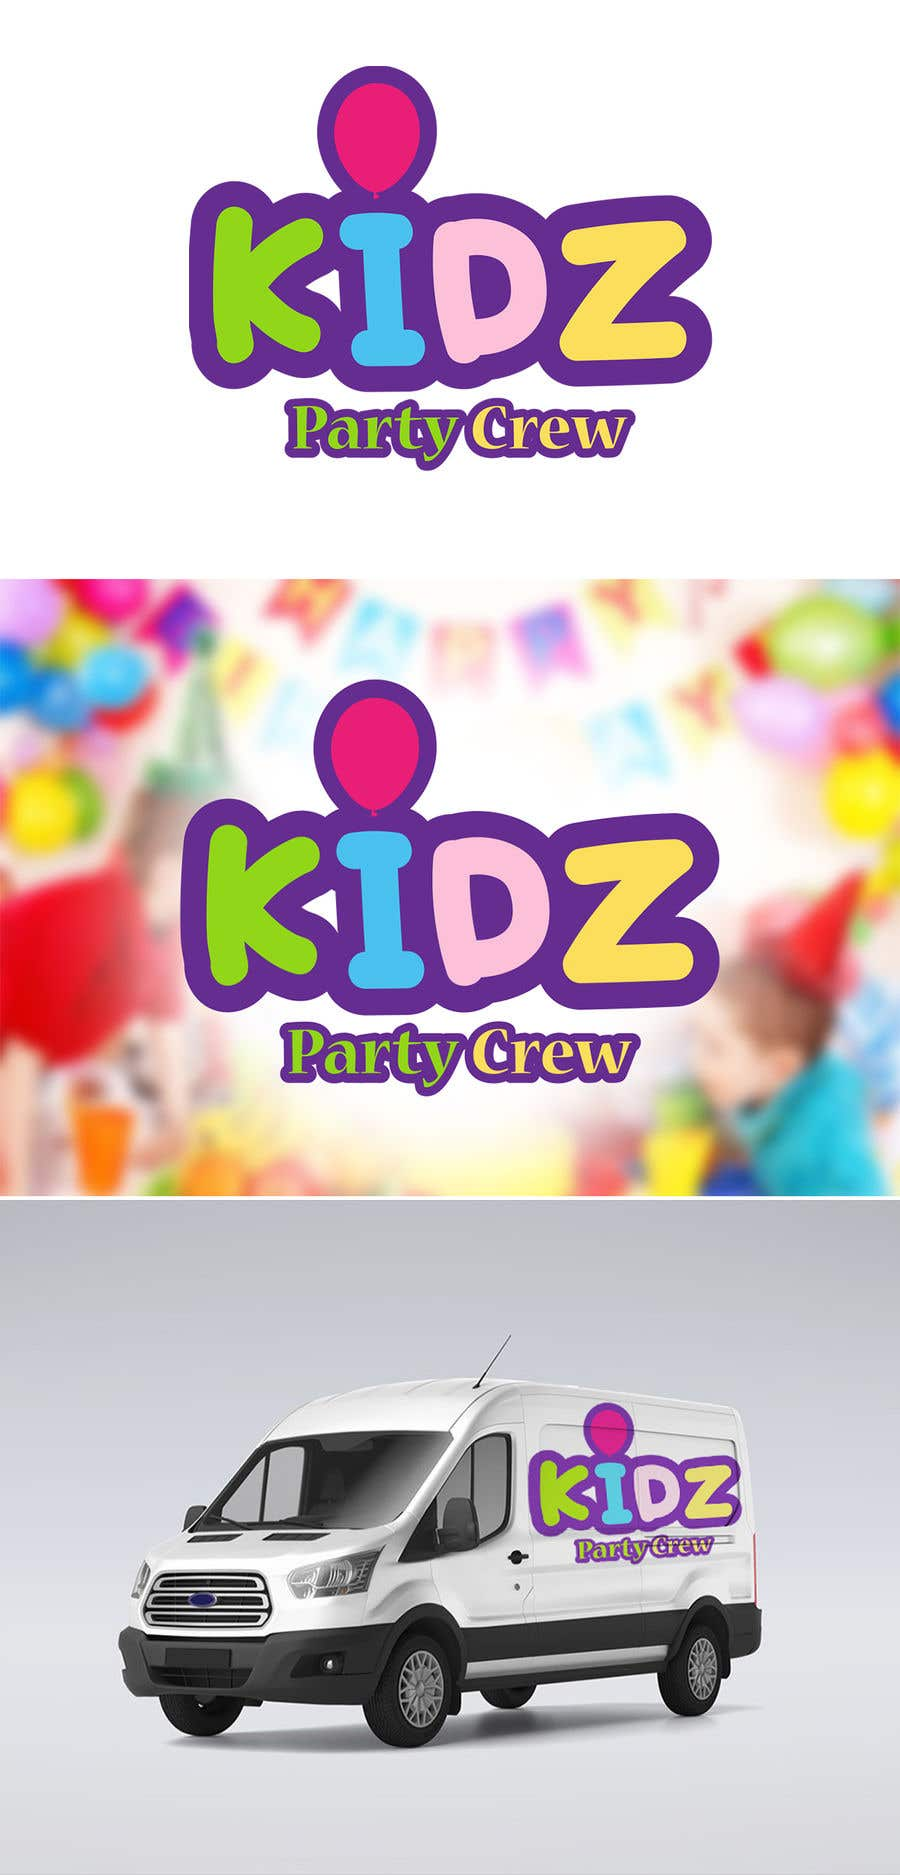 Konkurrenceindlæg #28 for Logo for Kidz Party Crew